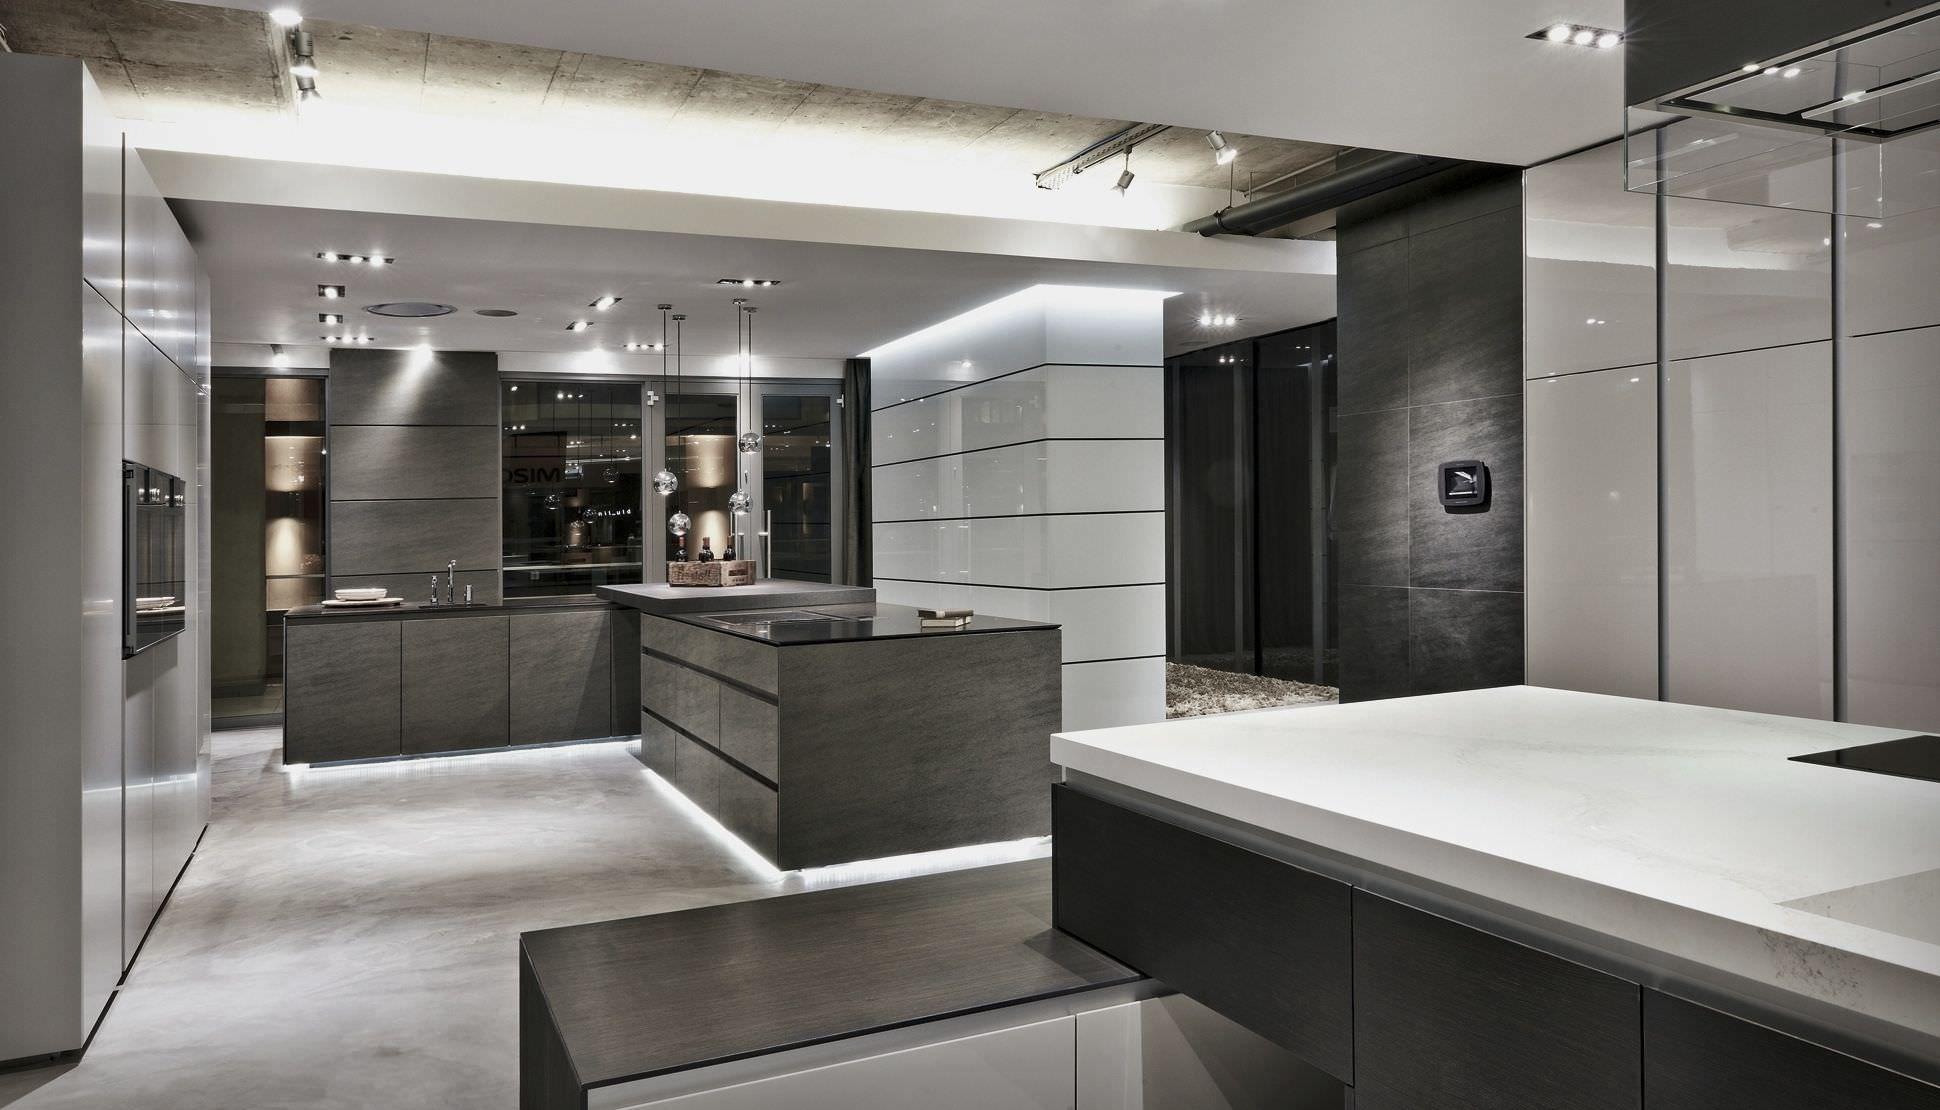 Luxury kitchen showroom | Showroom, Showroom design ...